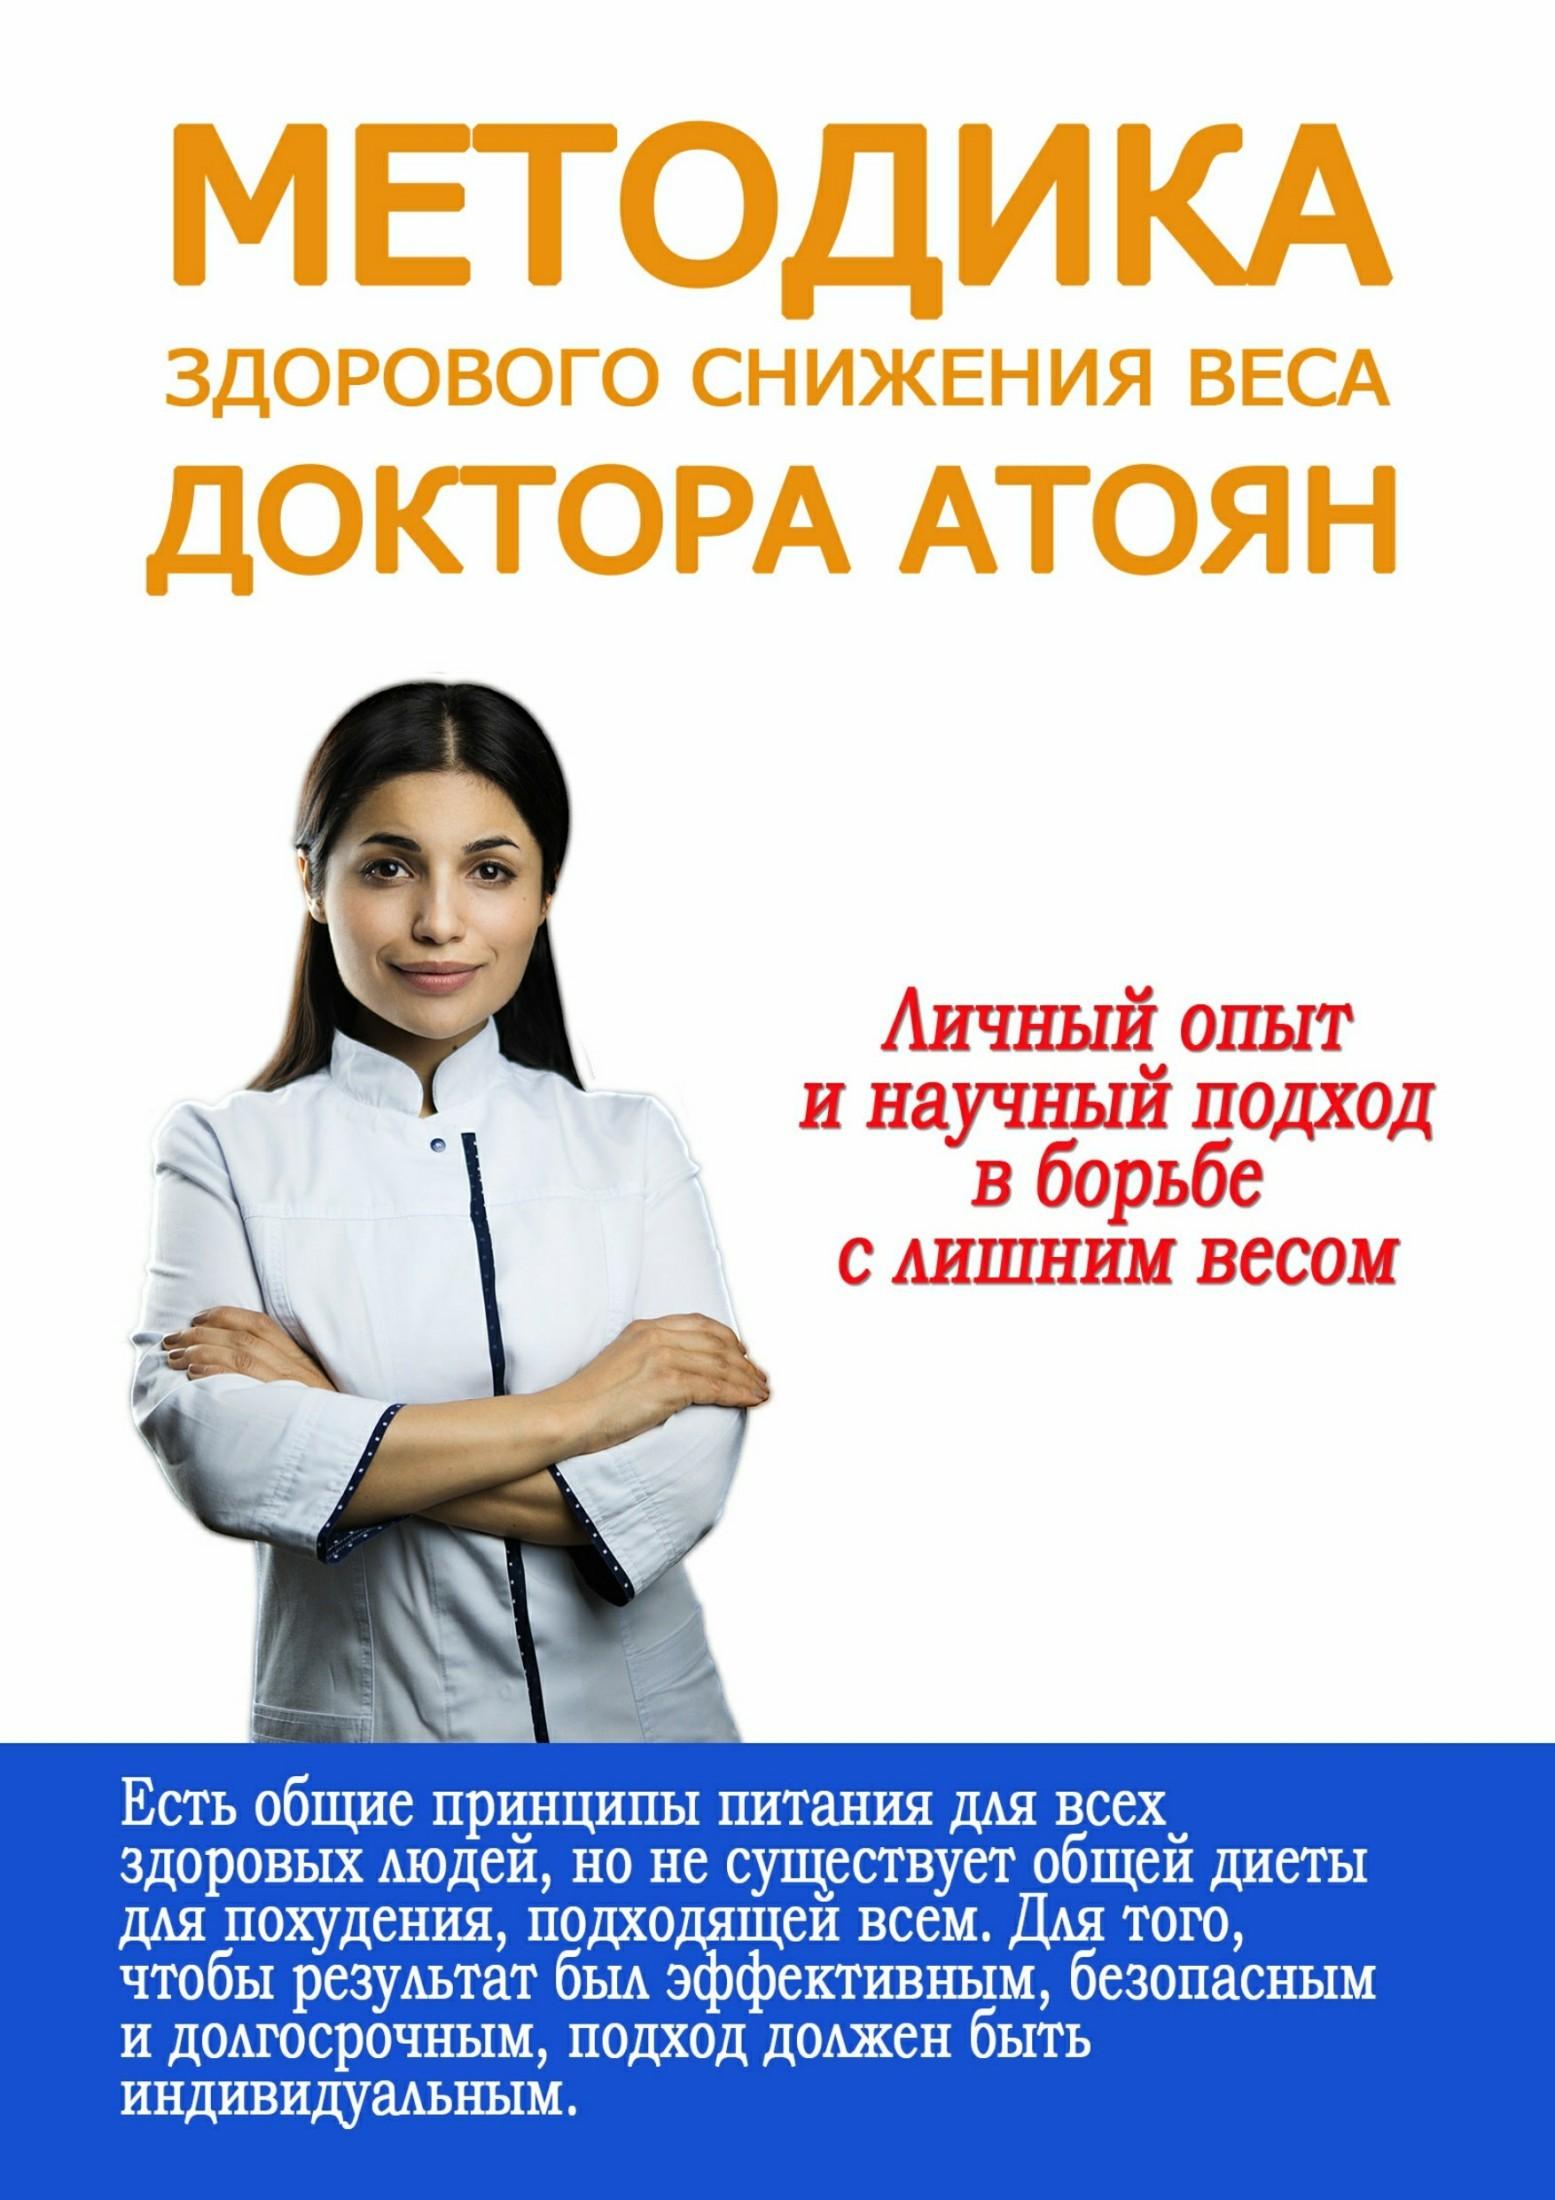 Юля Атоян «Методика здорового снижения веса доктора Атоян»